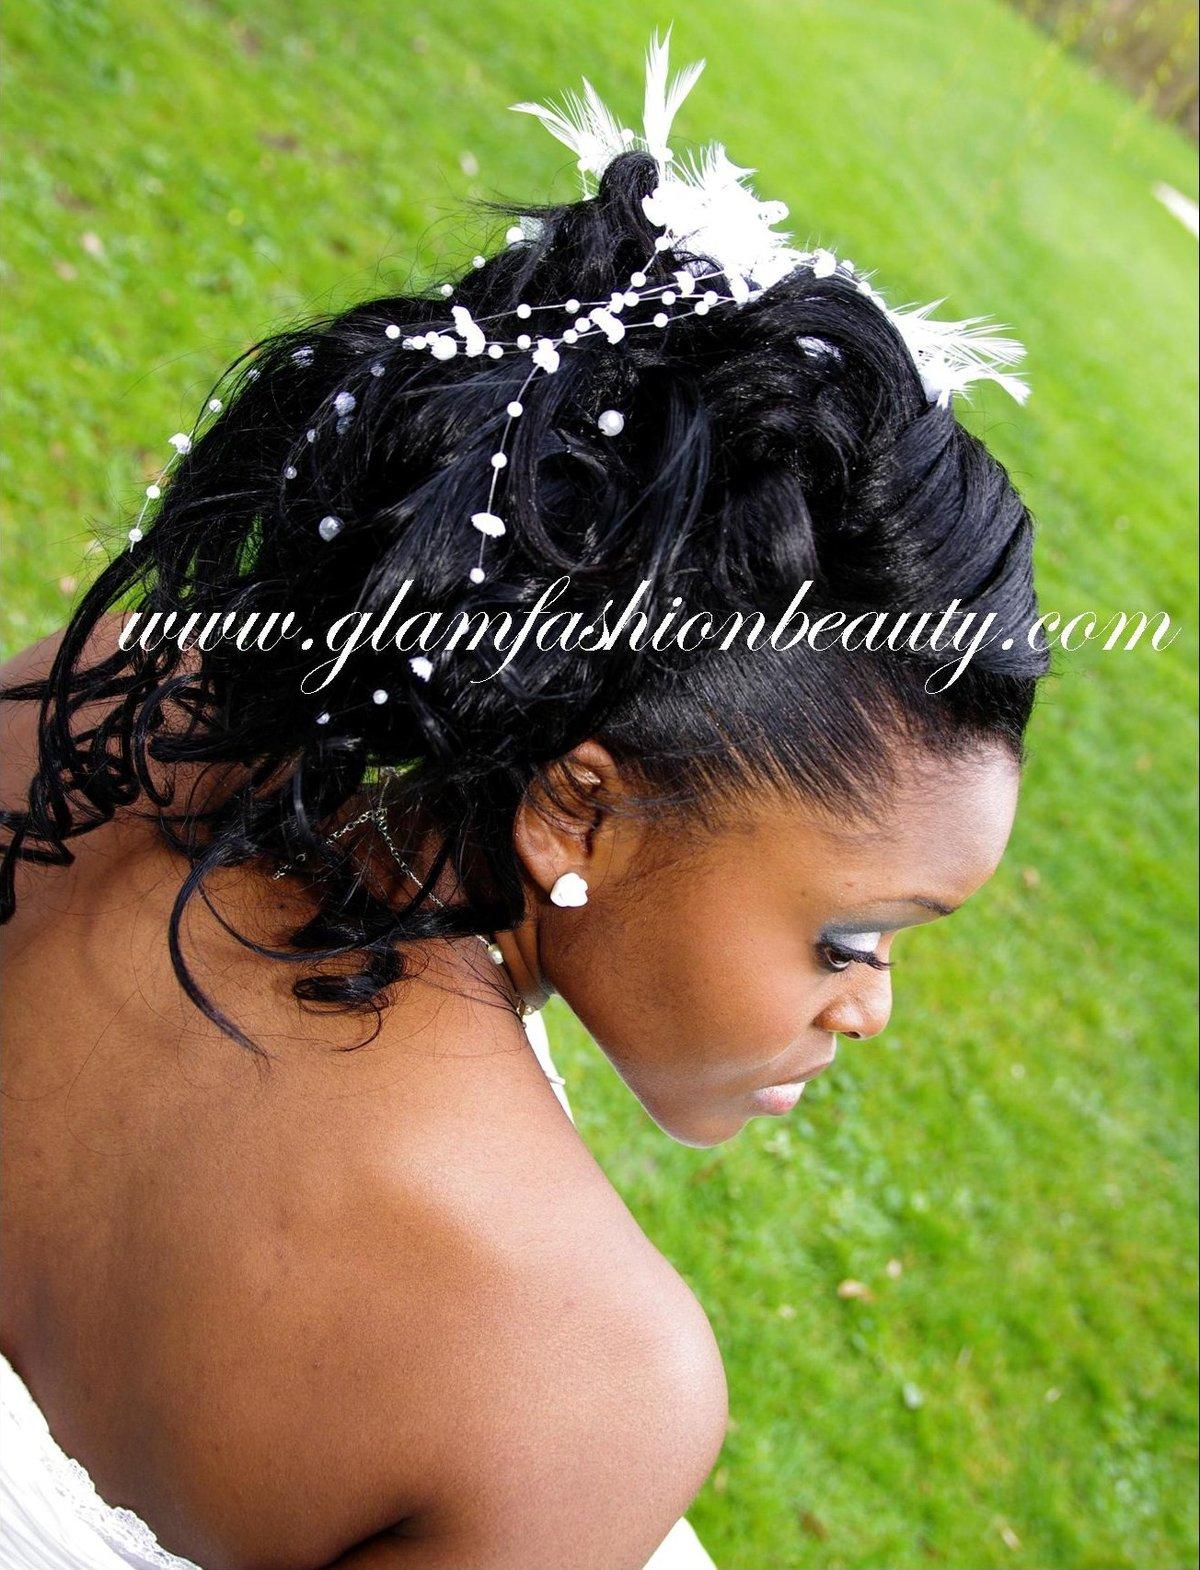 Coiffure de mariée / Coiffure de cérémonie